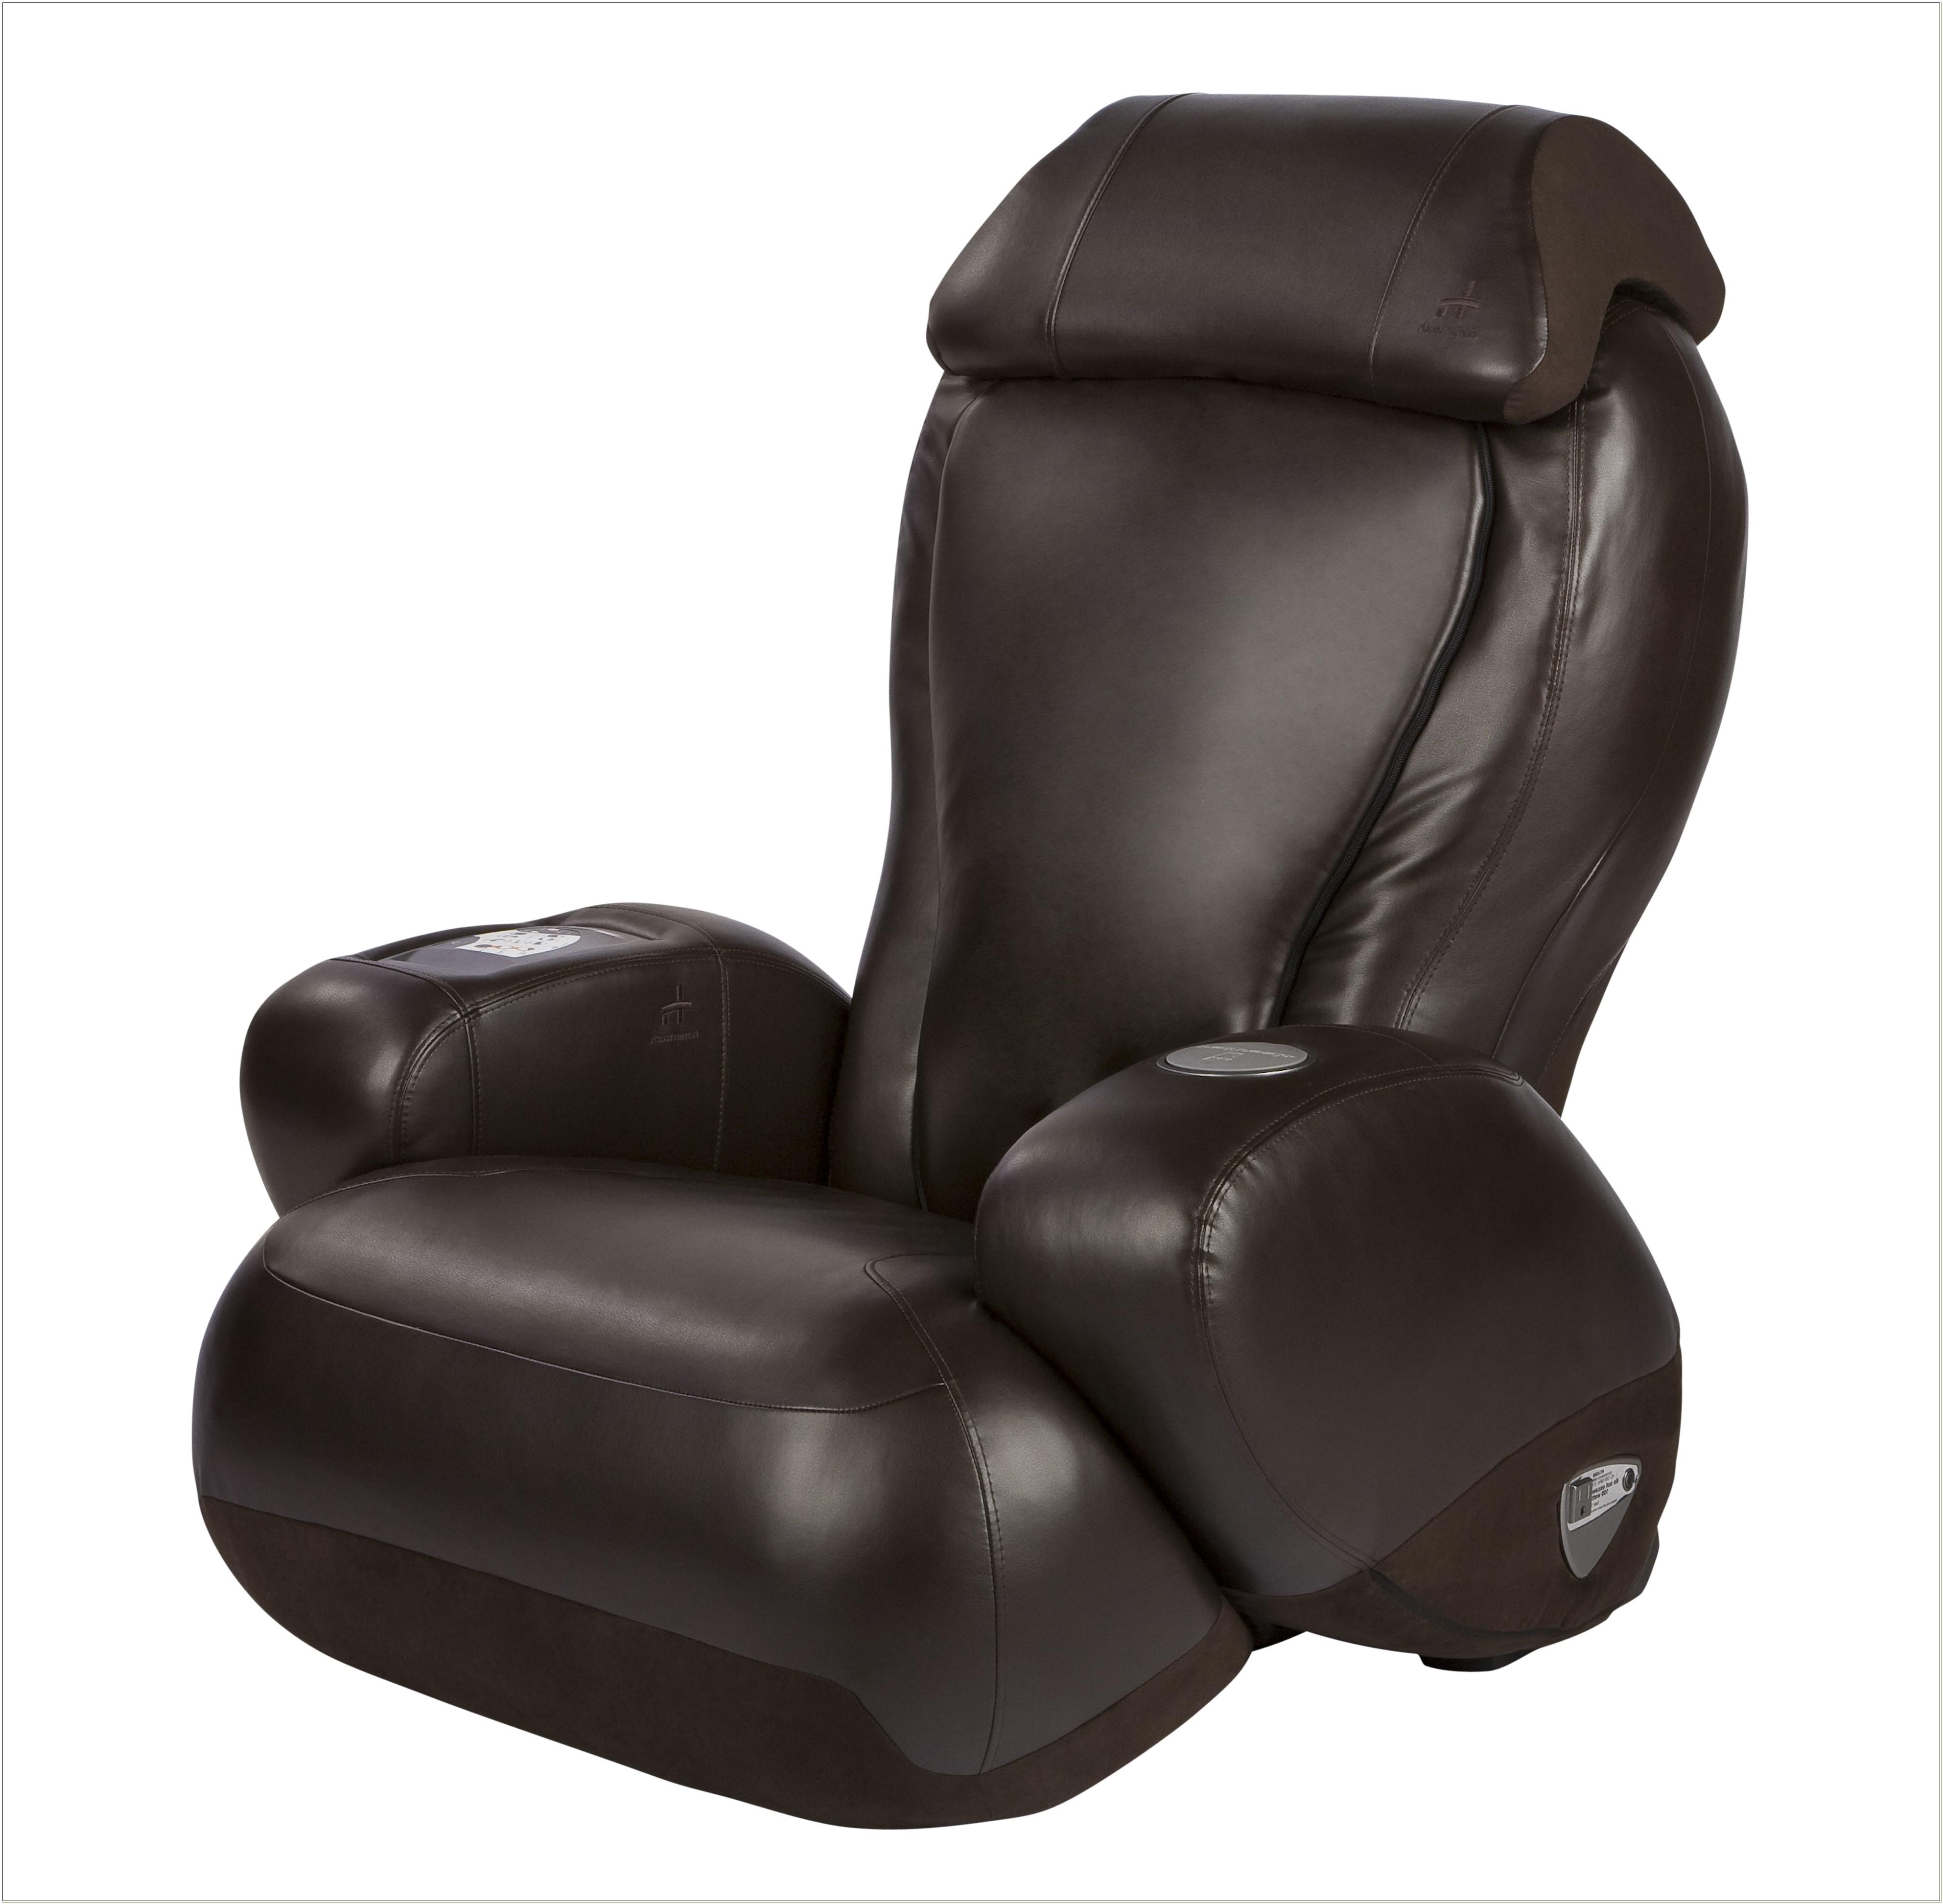 Sharper Image Ijoy Reclining Massage Chair